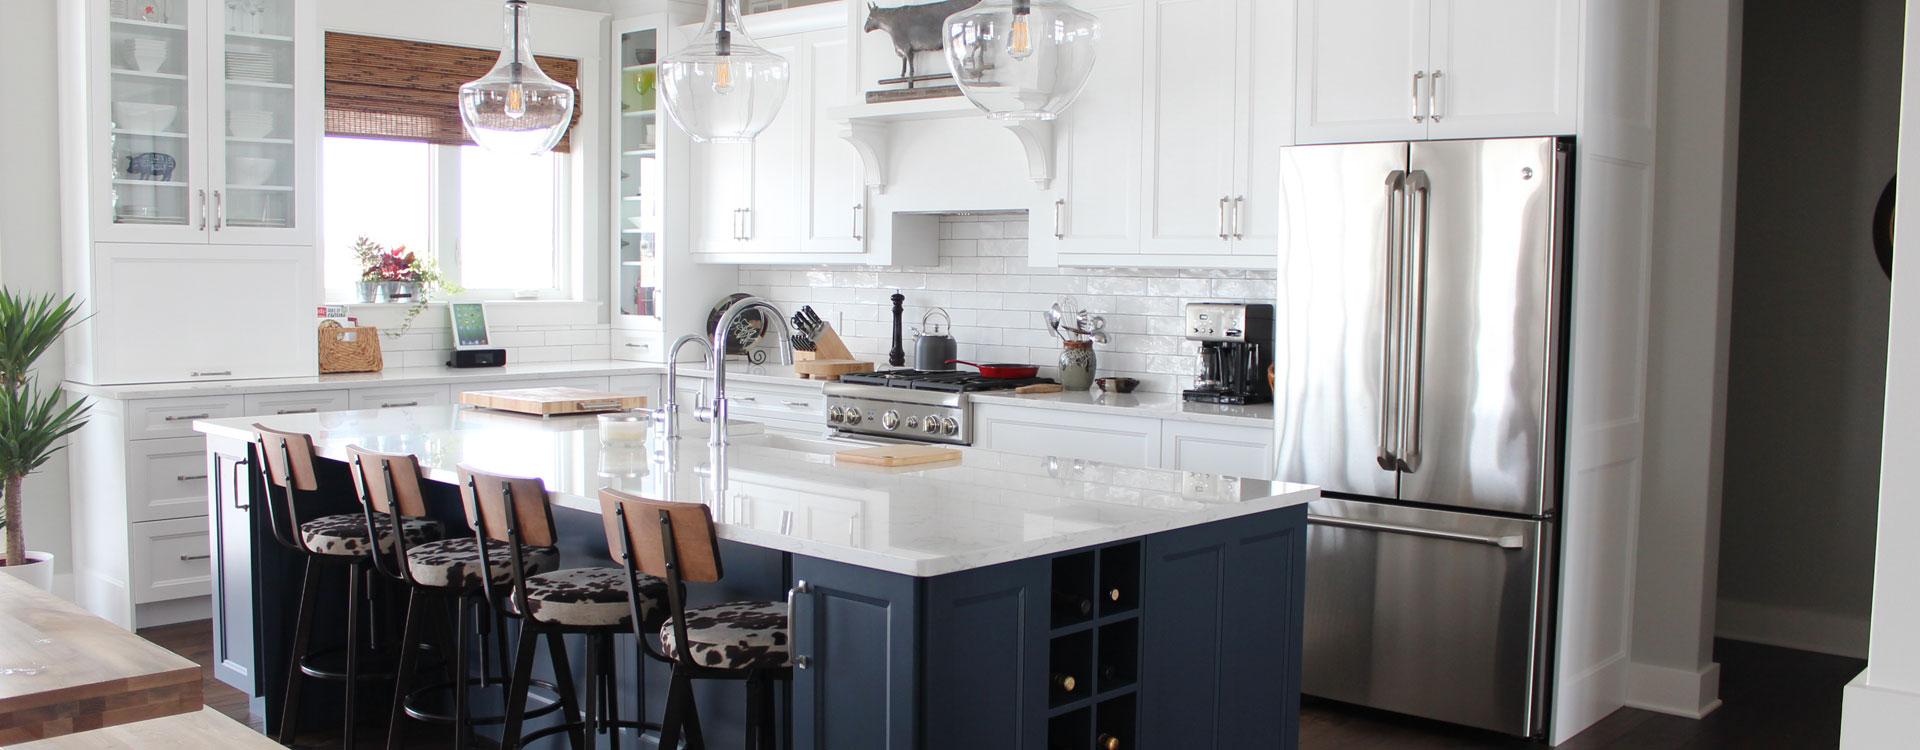 Hawthorne Kitchens - Designed For Living – Built For Life